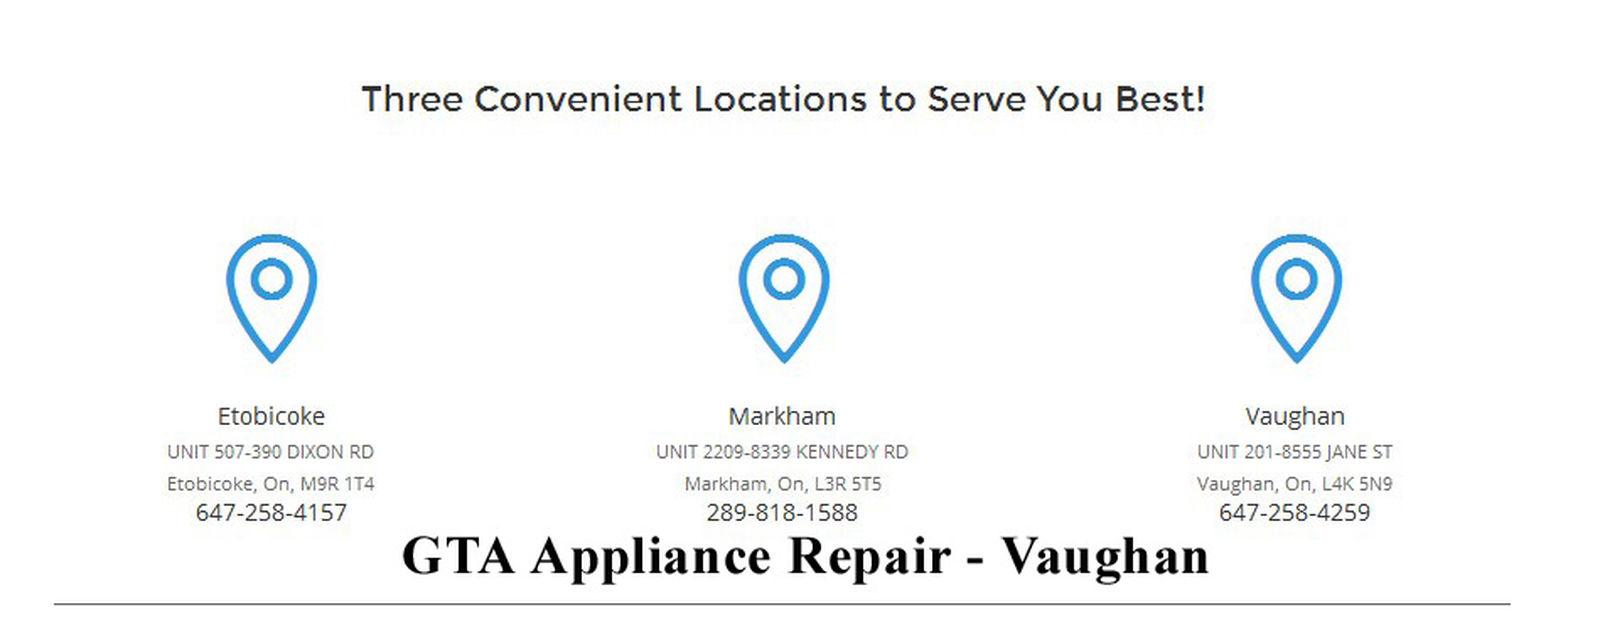 GTA Appliance Repair, 8555 Jane St #201, Vaughan, ON L4K 5N9, (647) 258-4259, http://gtaappliancerepairs.ca/vaughan.html Appliance Repair In Vaughan Appliance Repair In Vaughan ON Appliance Repair Vaughan Appliance Repair Vaughan ON Best Appliance Repair Vaughan Top Appliance Repair Vaughan Top Appliance Repair Vaughan ON Vaughan Appliance Repair Vaughan ON Appliance Repair